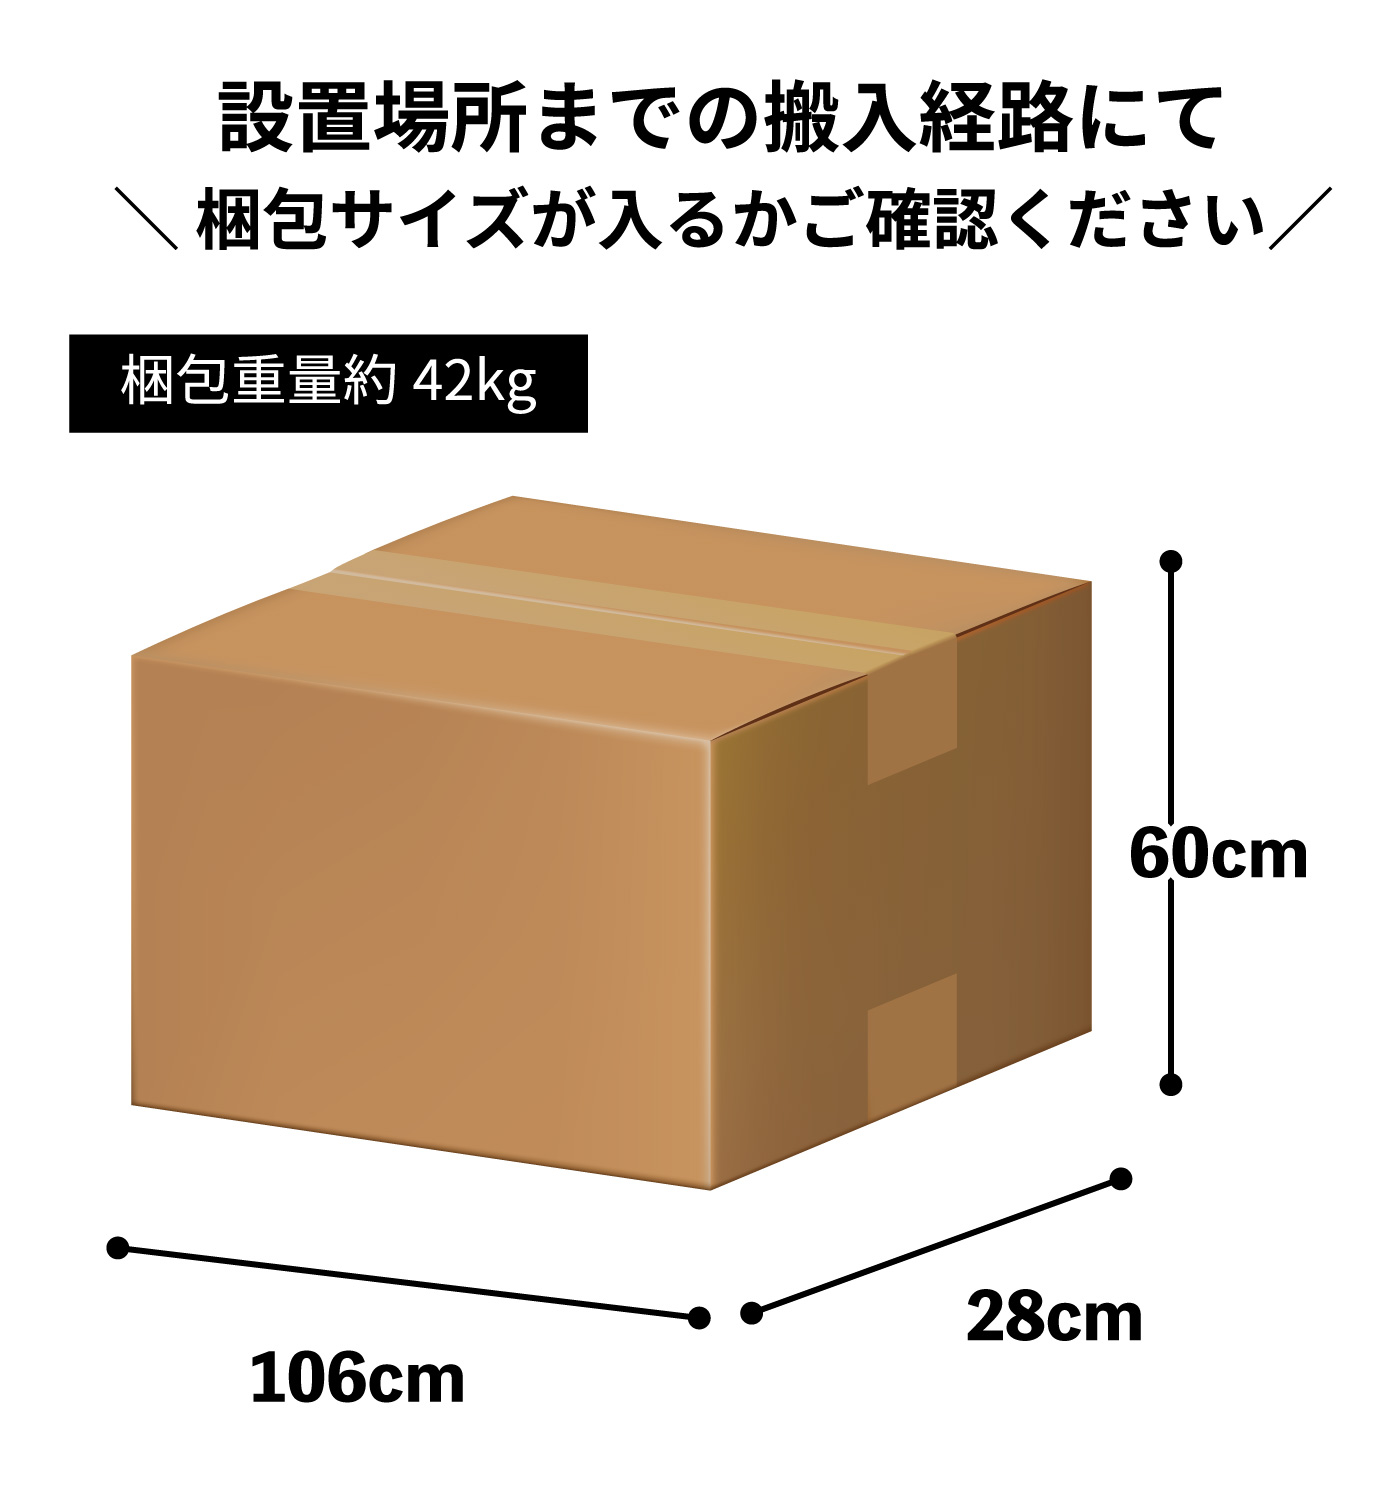 DK-1007Aの梱包サイズ